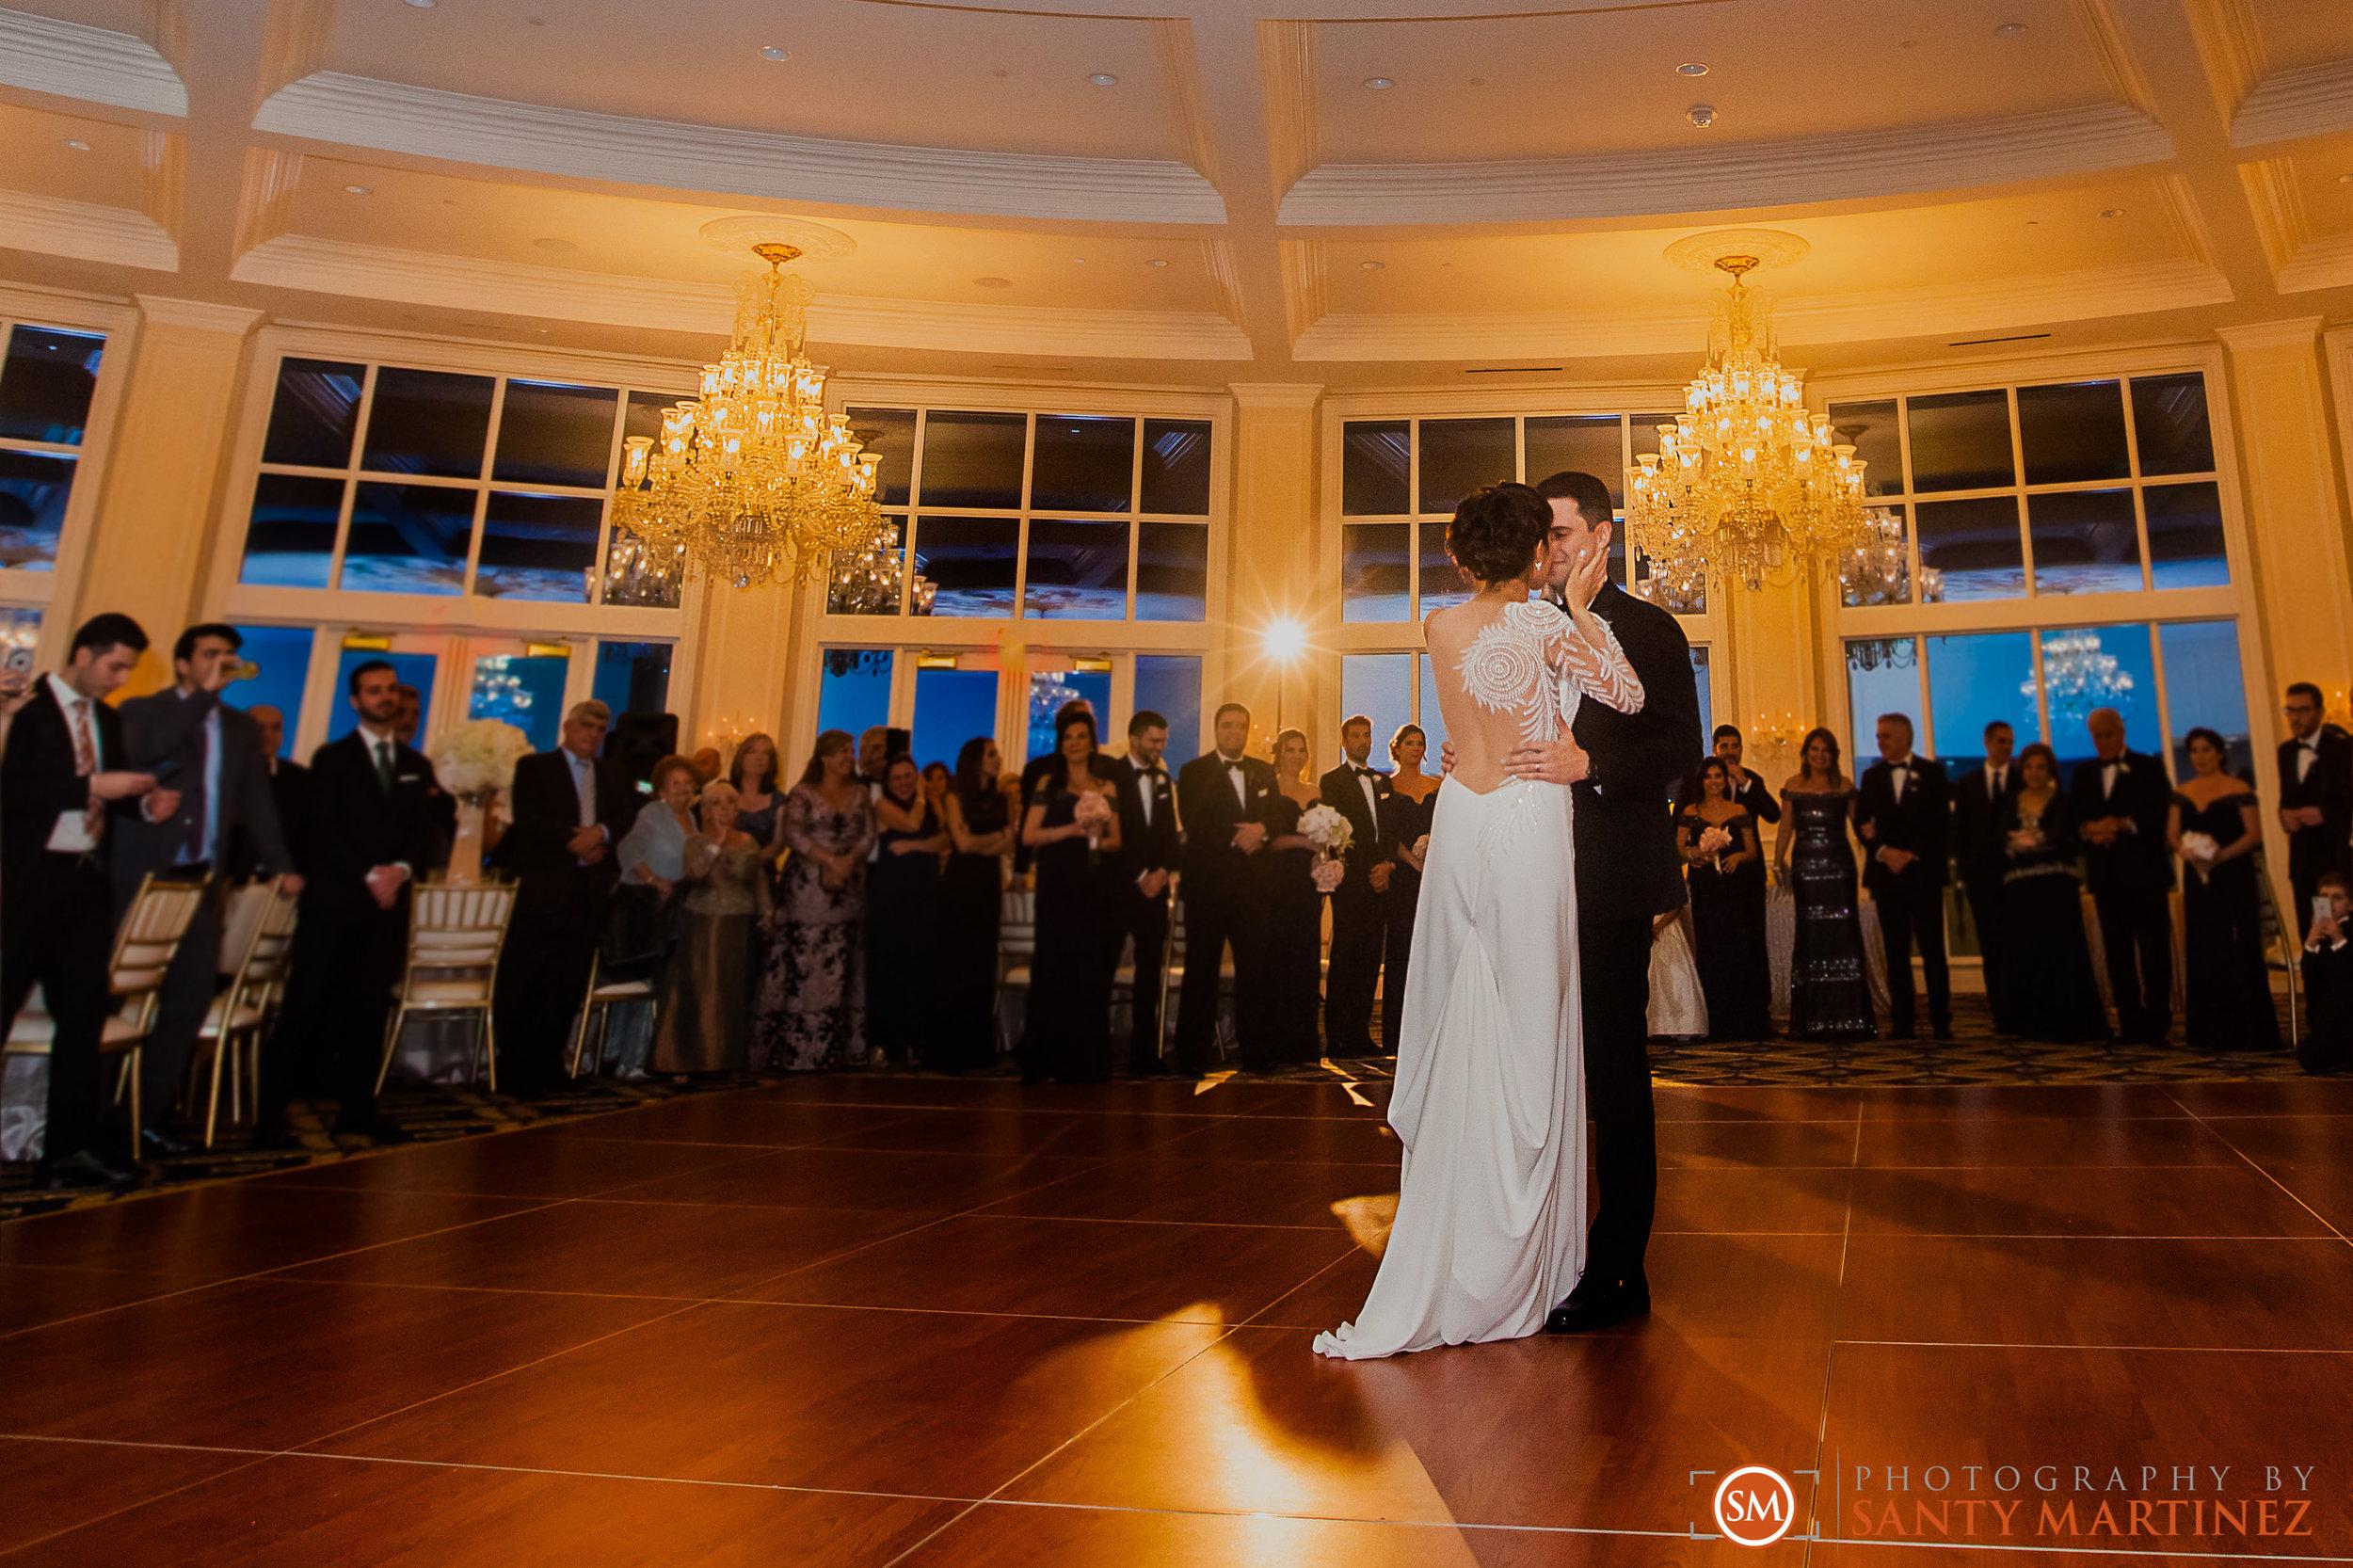 Wedding Trump National Doral Miami - Photography by Santy Martinez-33.jpg